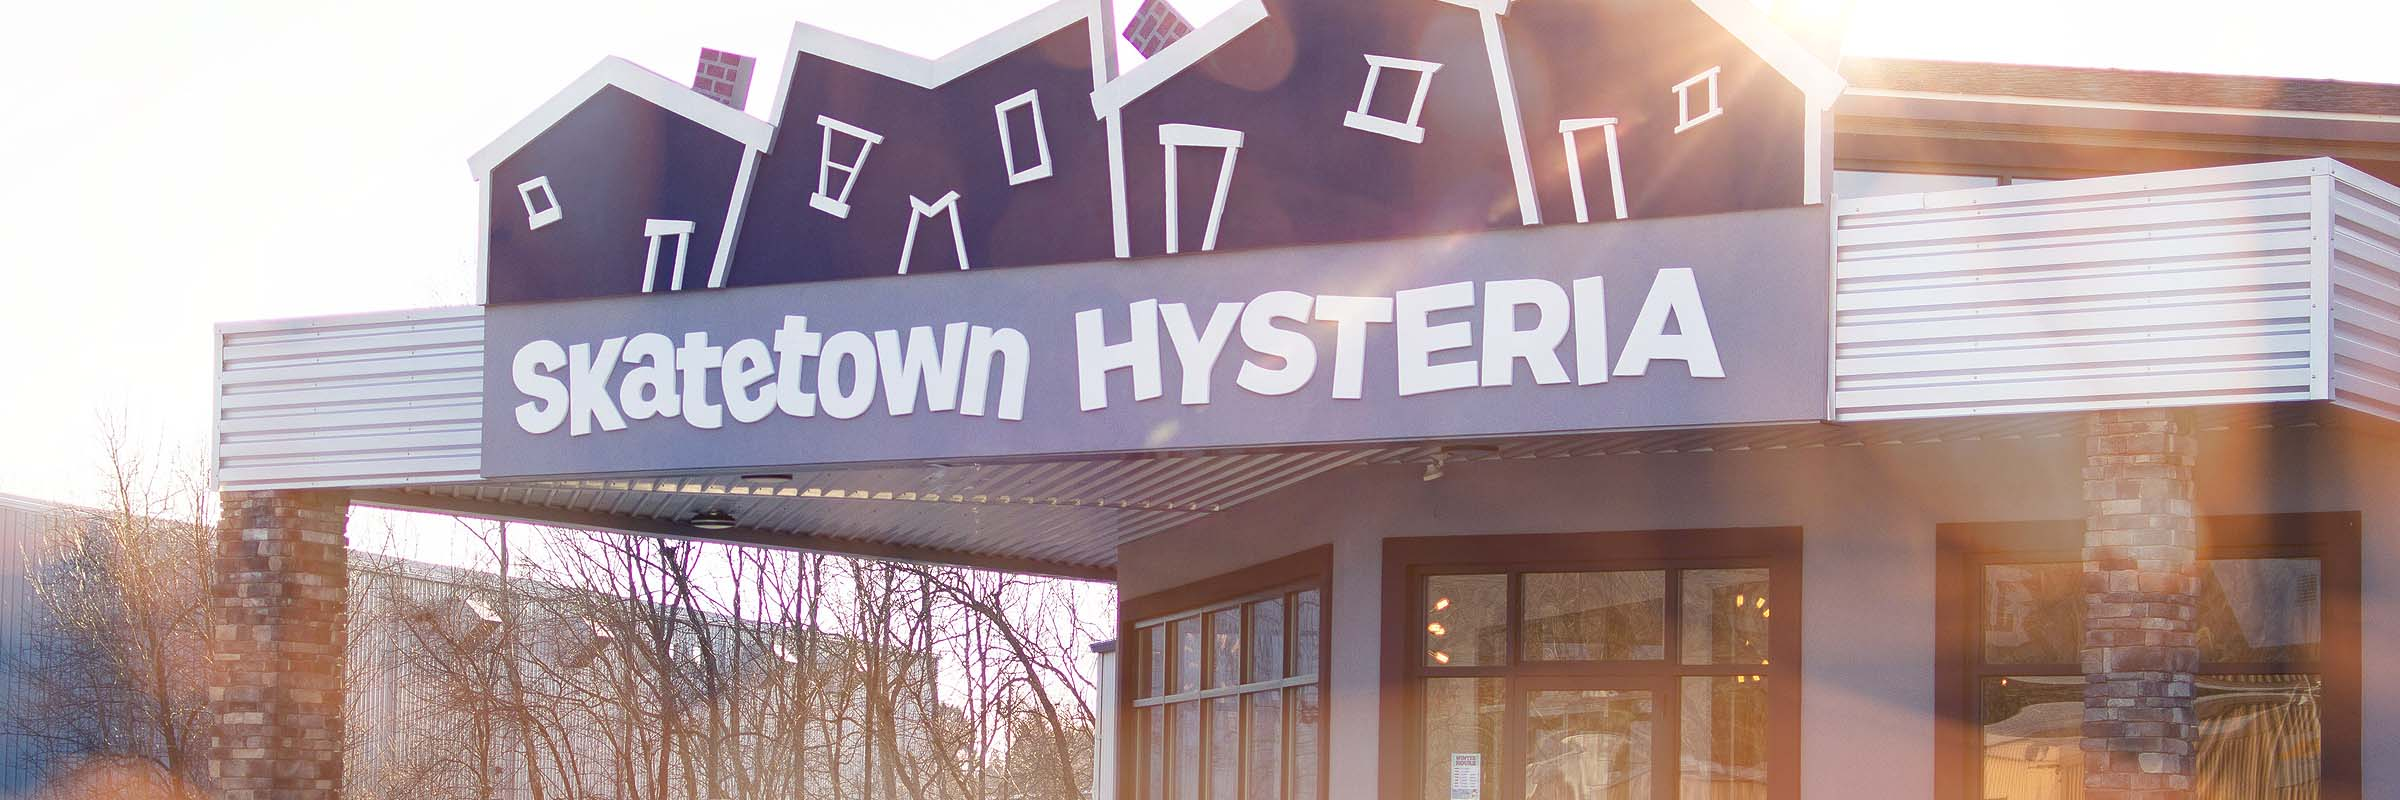 Skatetown Hysteria Exterior